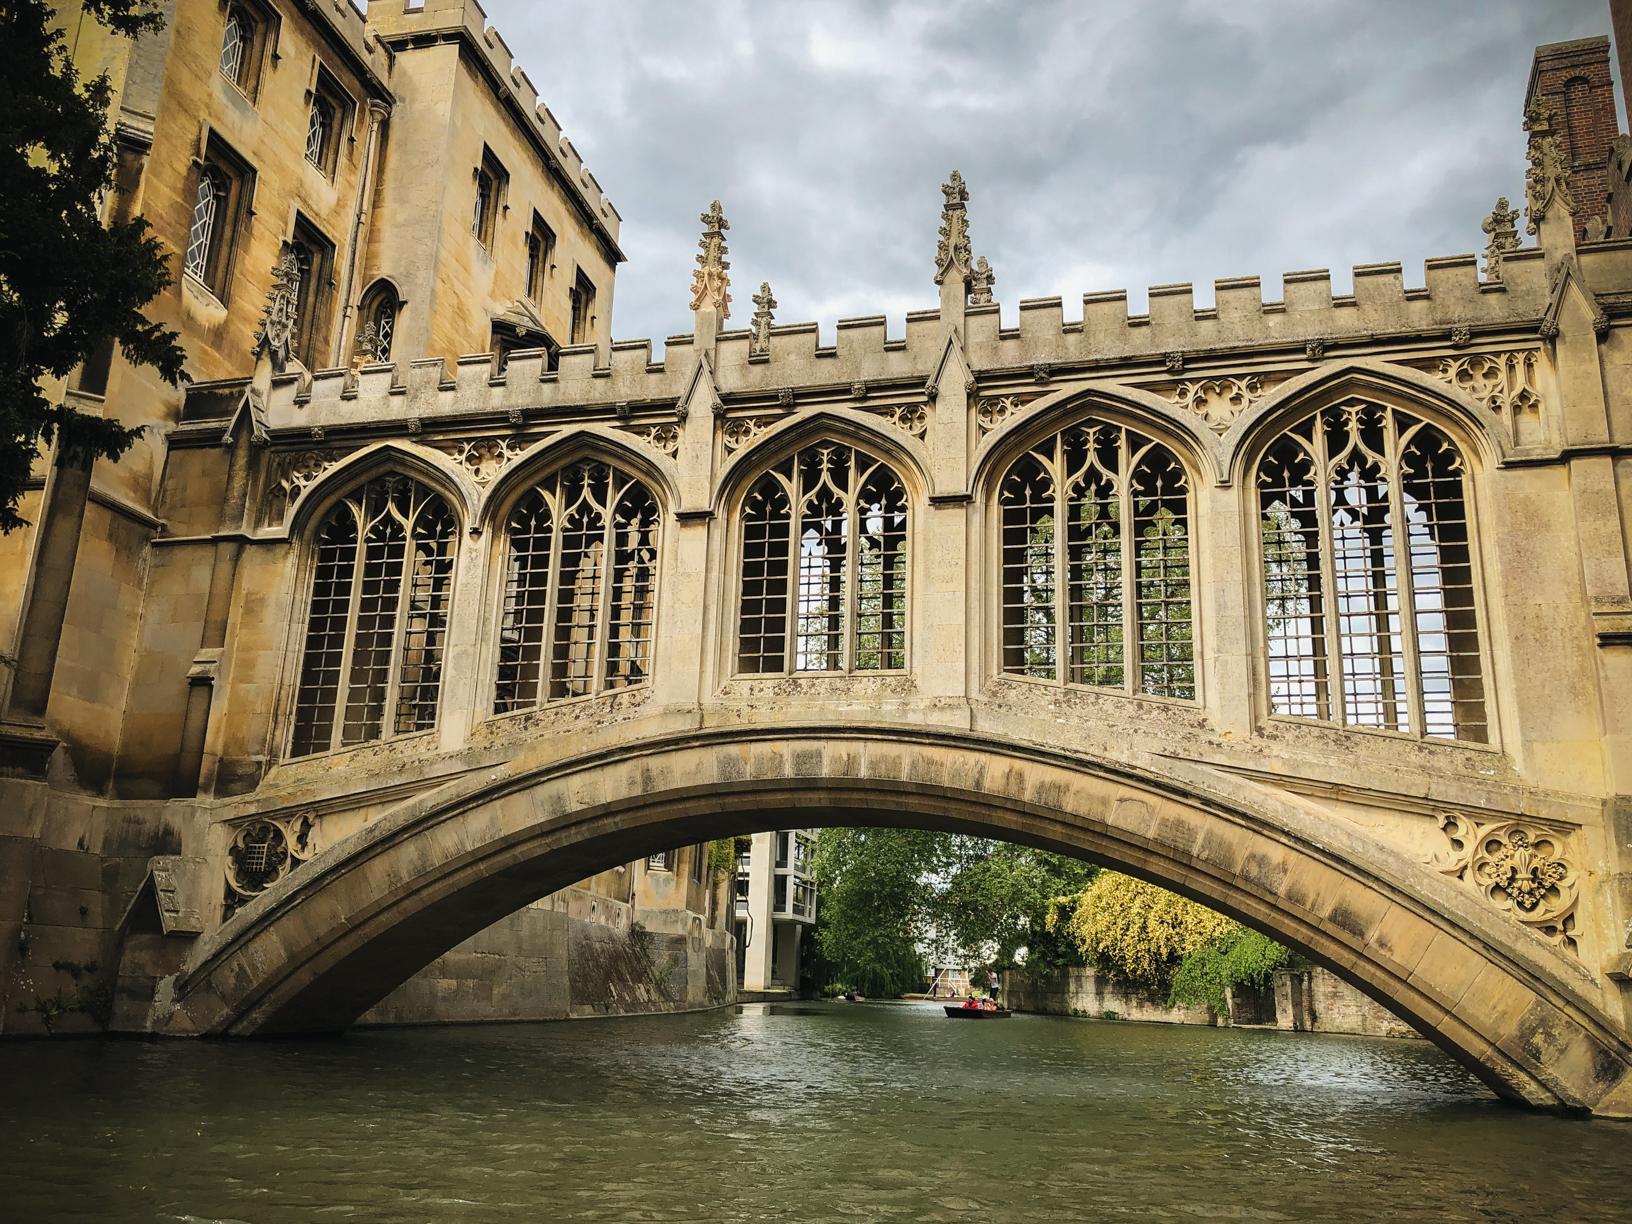 Punting-in-Cambridge-bridge-of-sighs.jpg